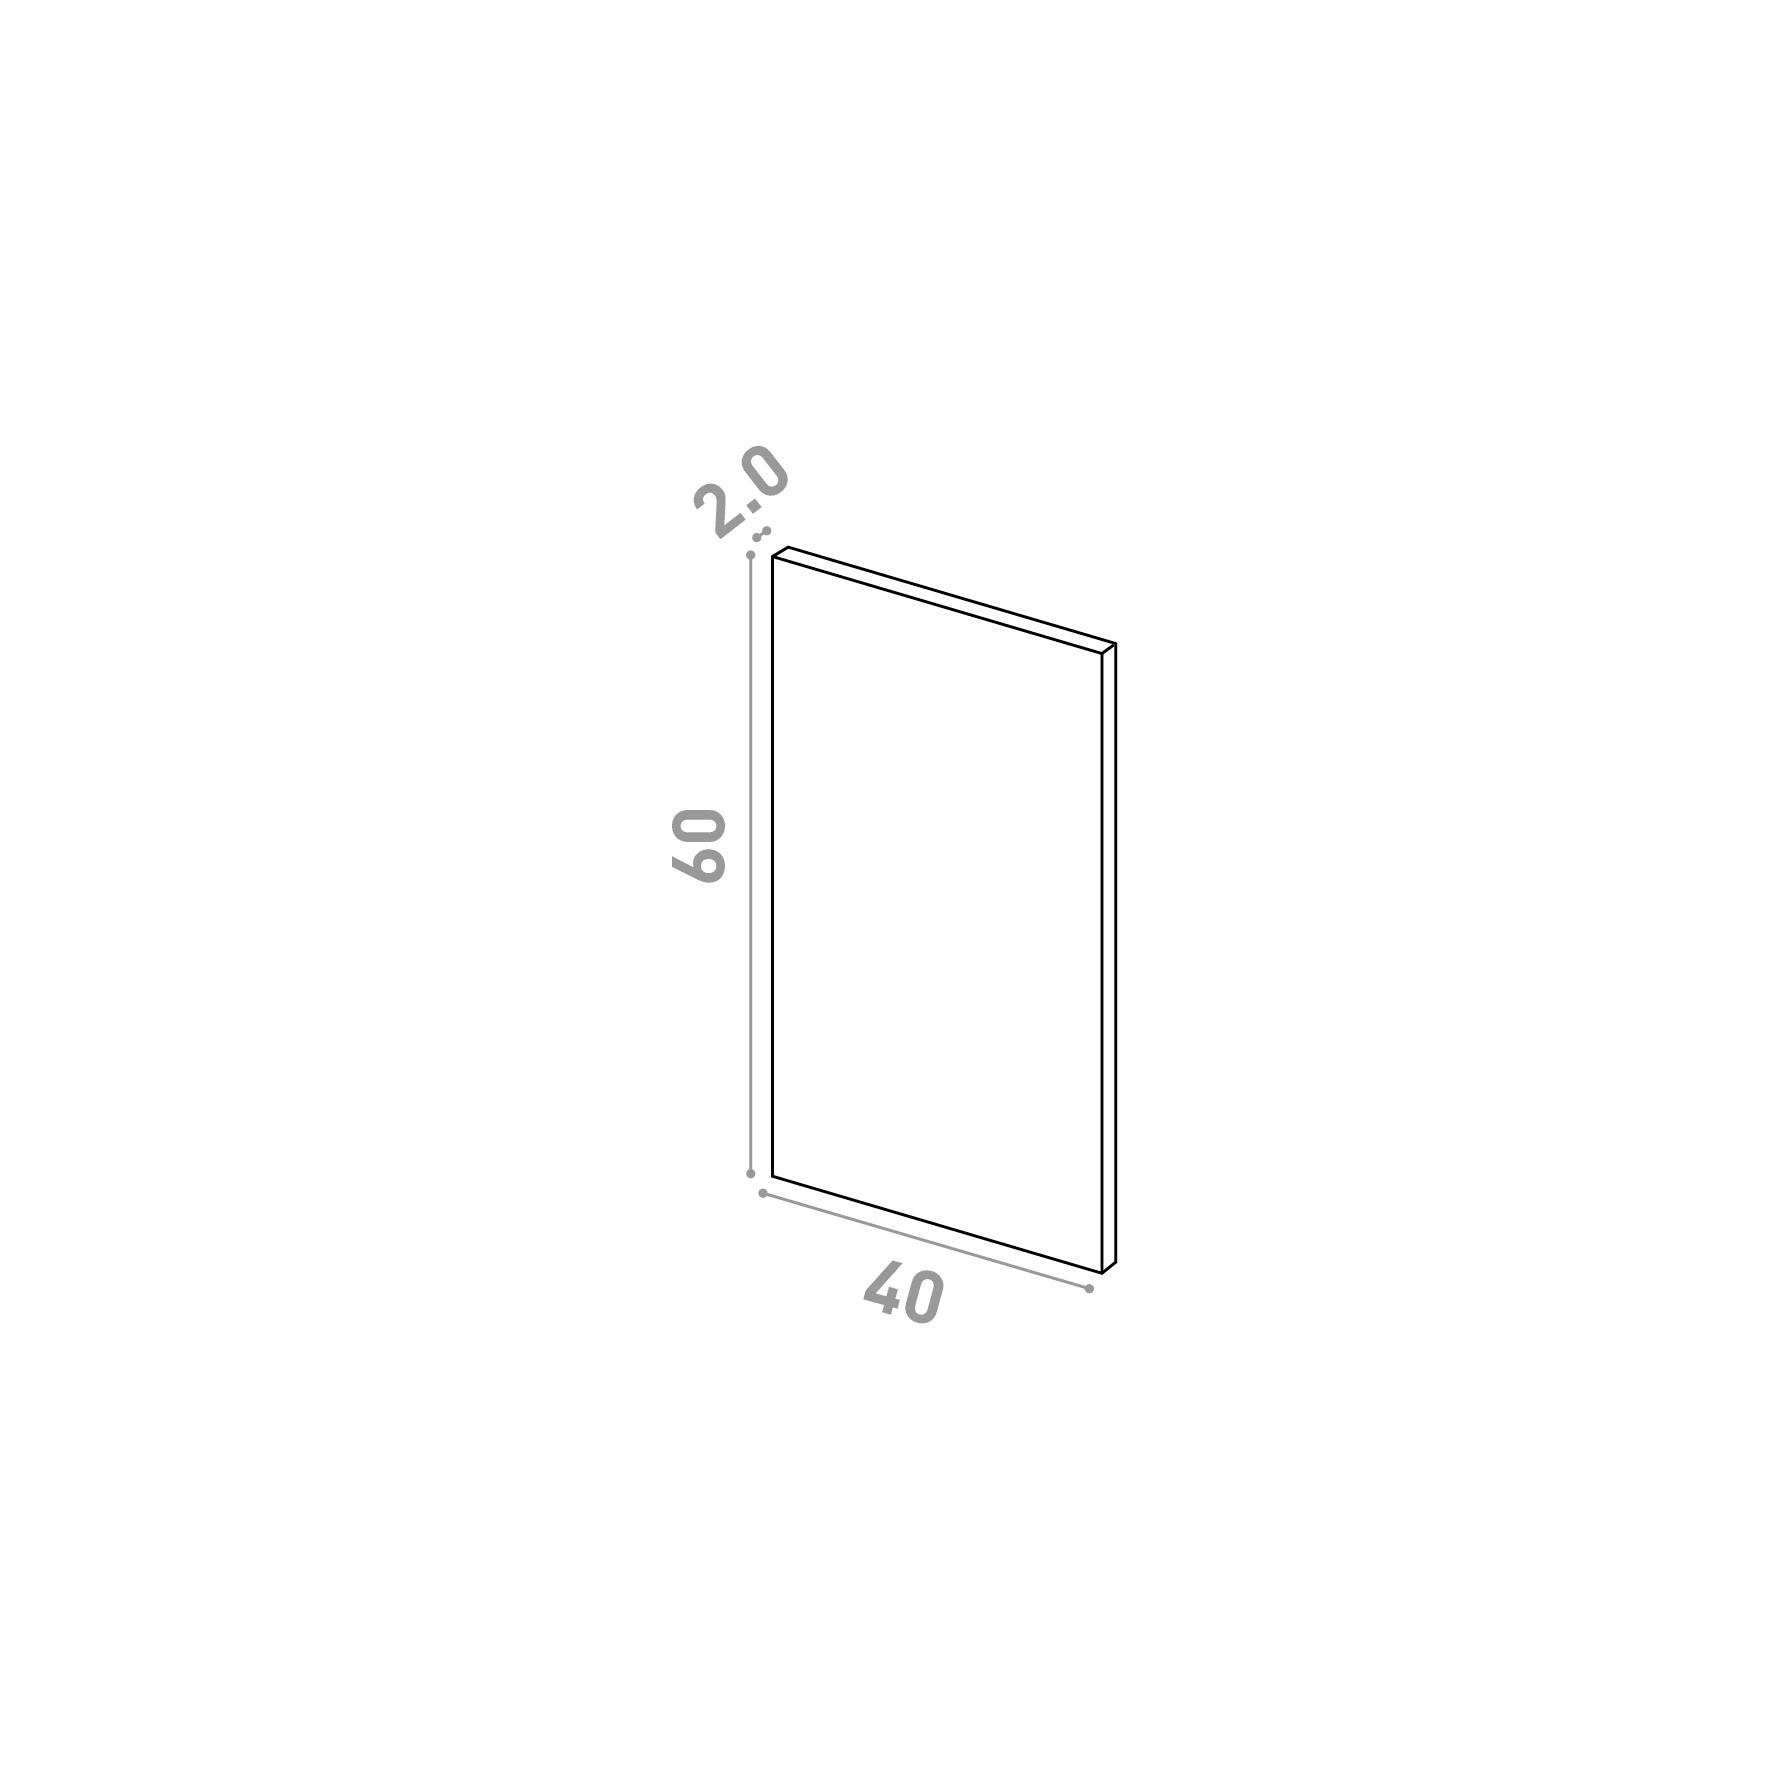 Porte 40X60cm   design lisse   chêne naturel